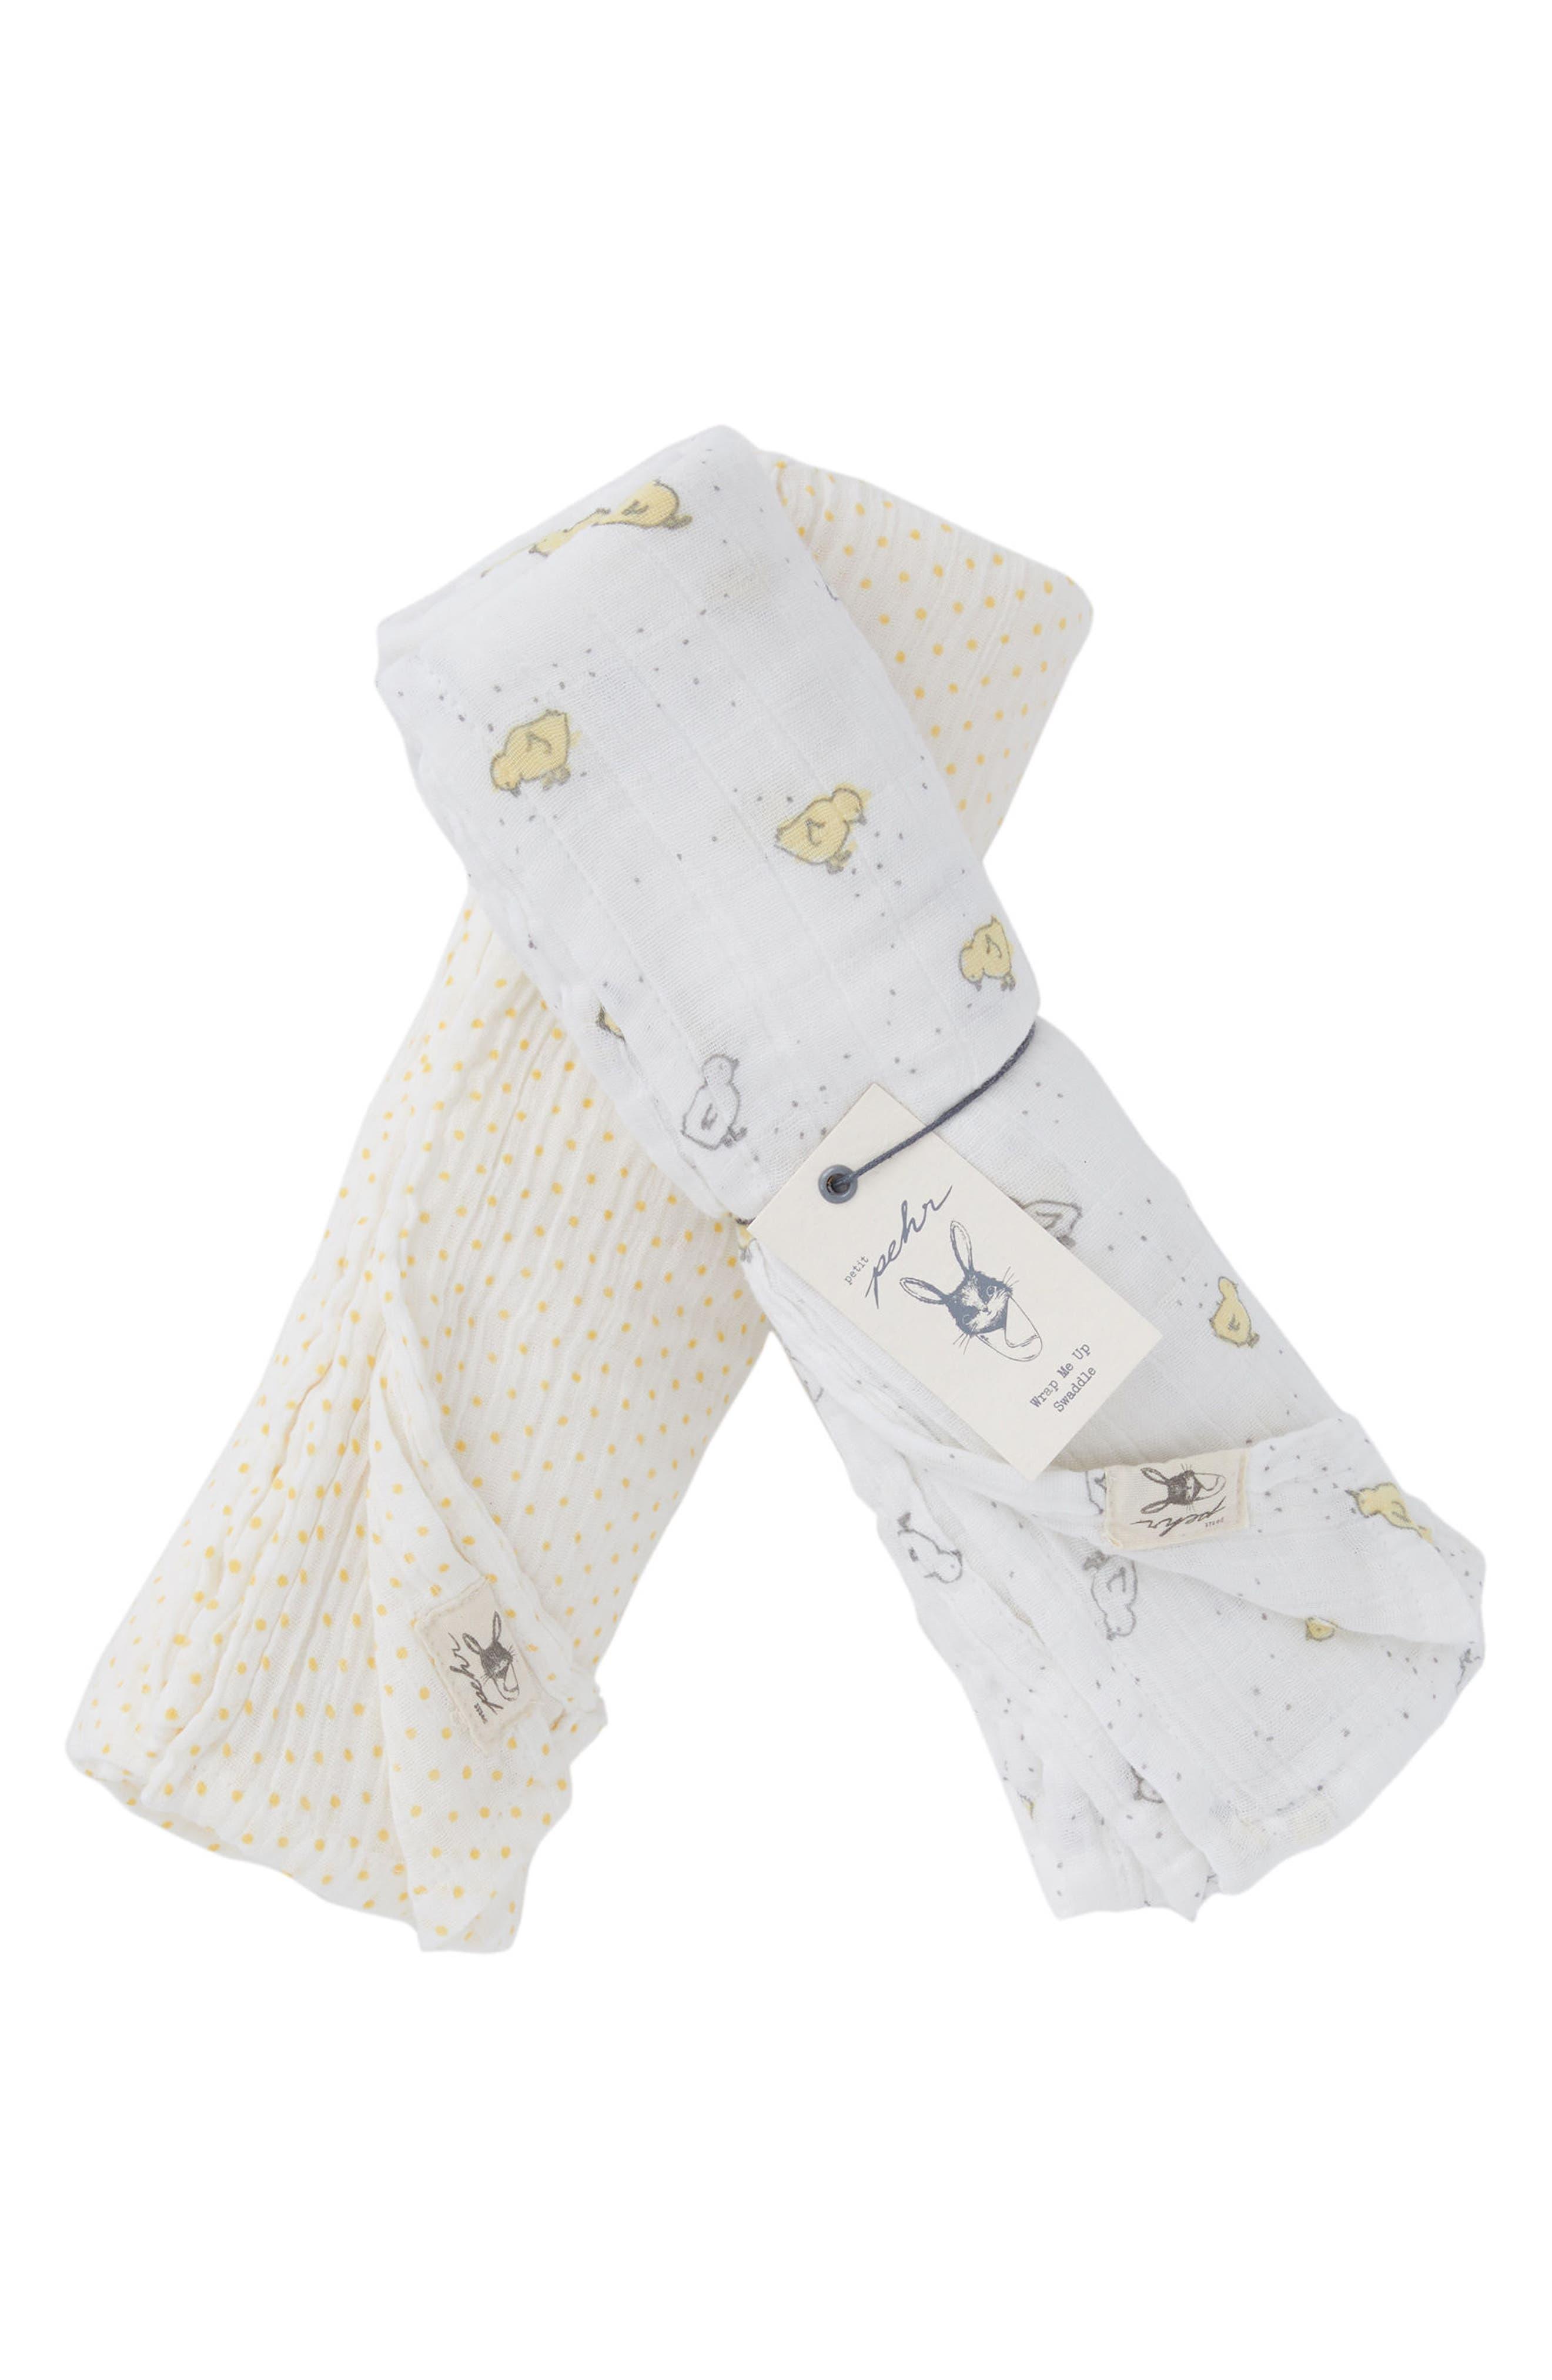 Petit Pehr Chick Swaddle Blanket Set (Baby)